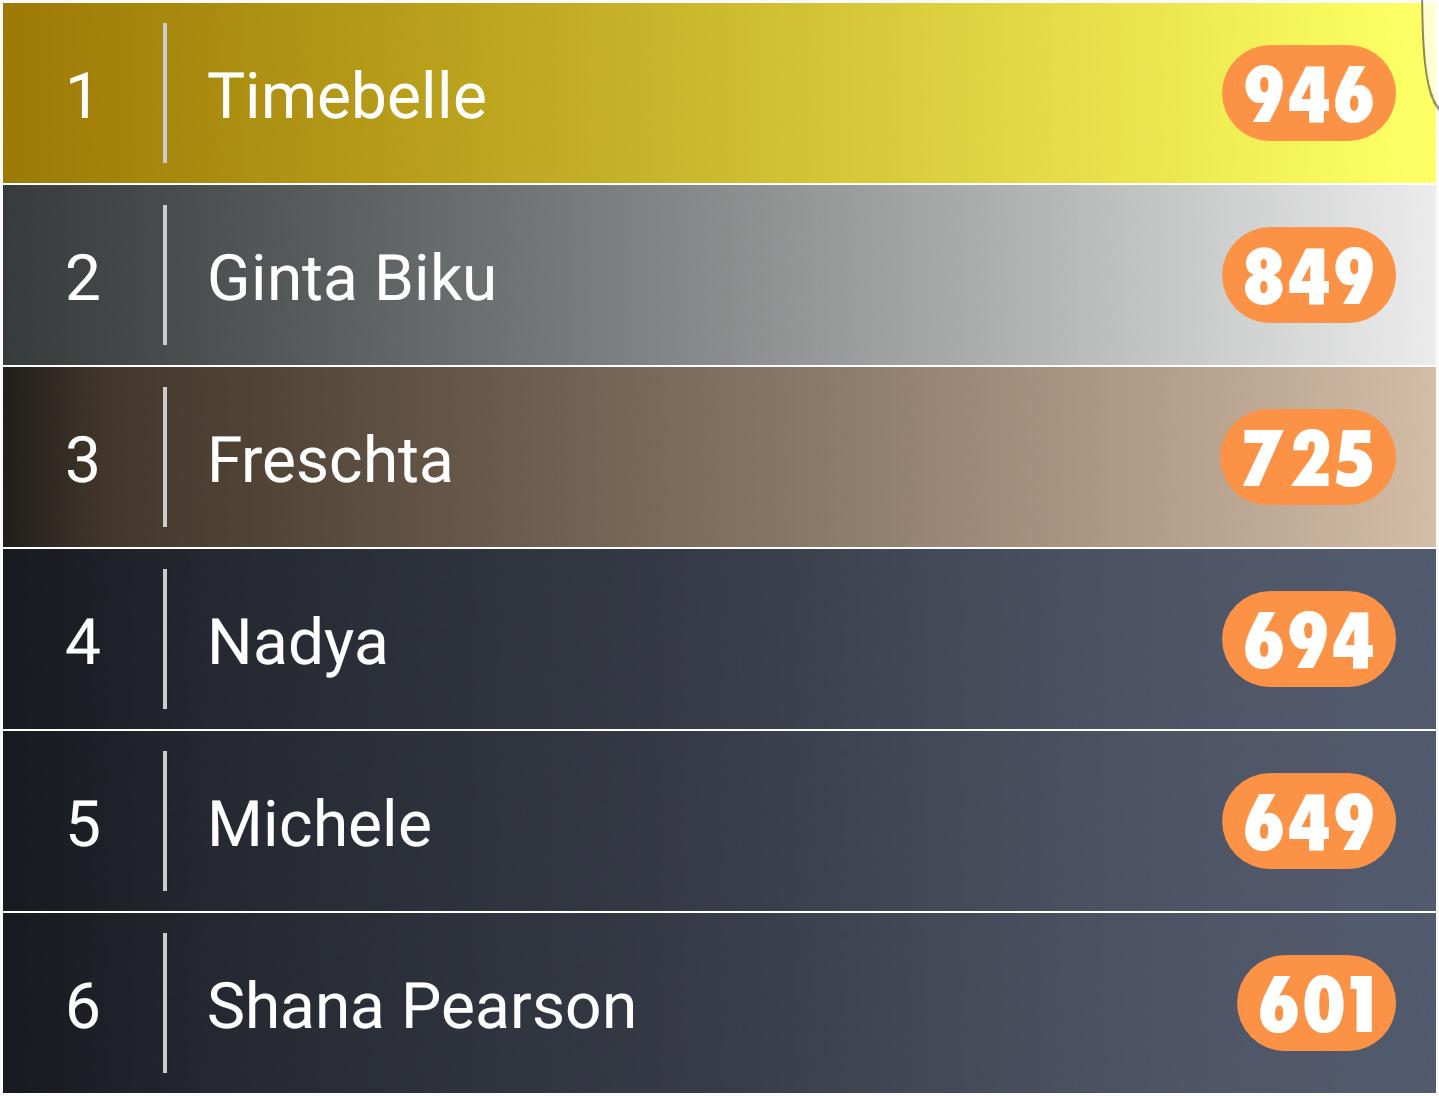 Timebelle Apollo My Eurovision Scoreboard 2017